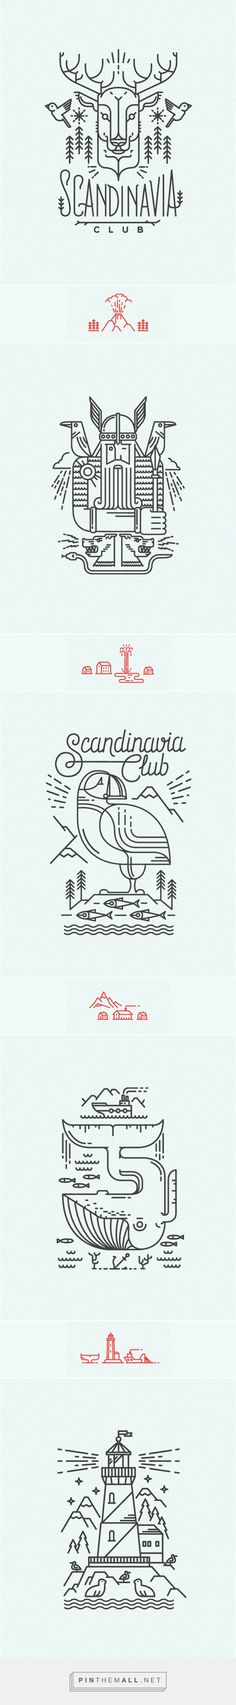 Scandinavian line illustrations for Scandinavia Club in Moscow | #illustration #design